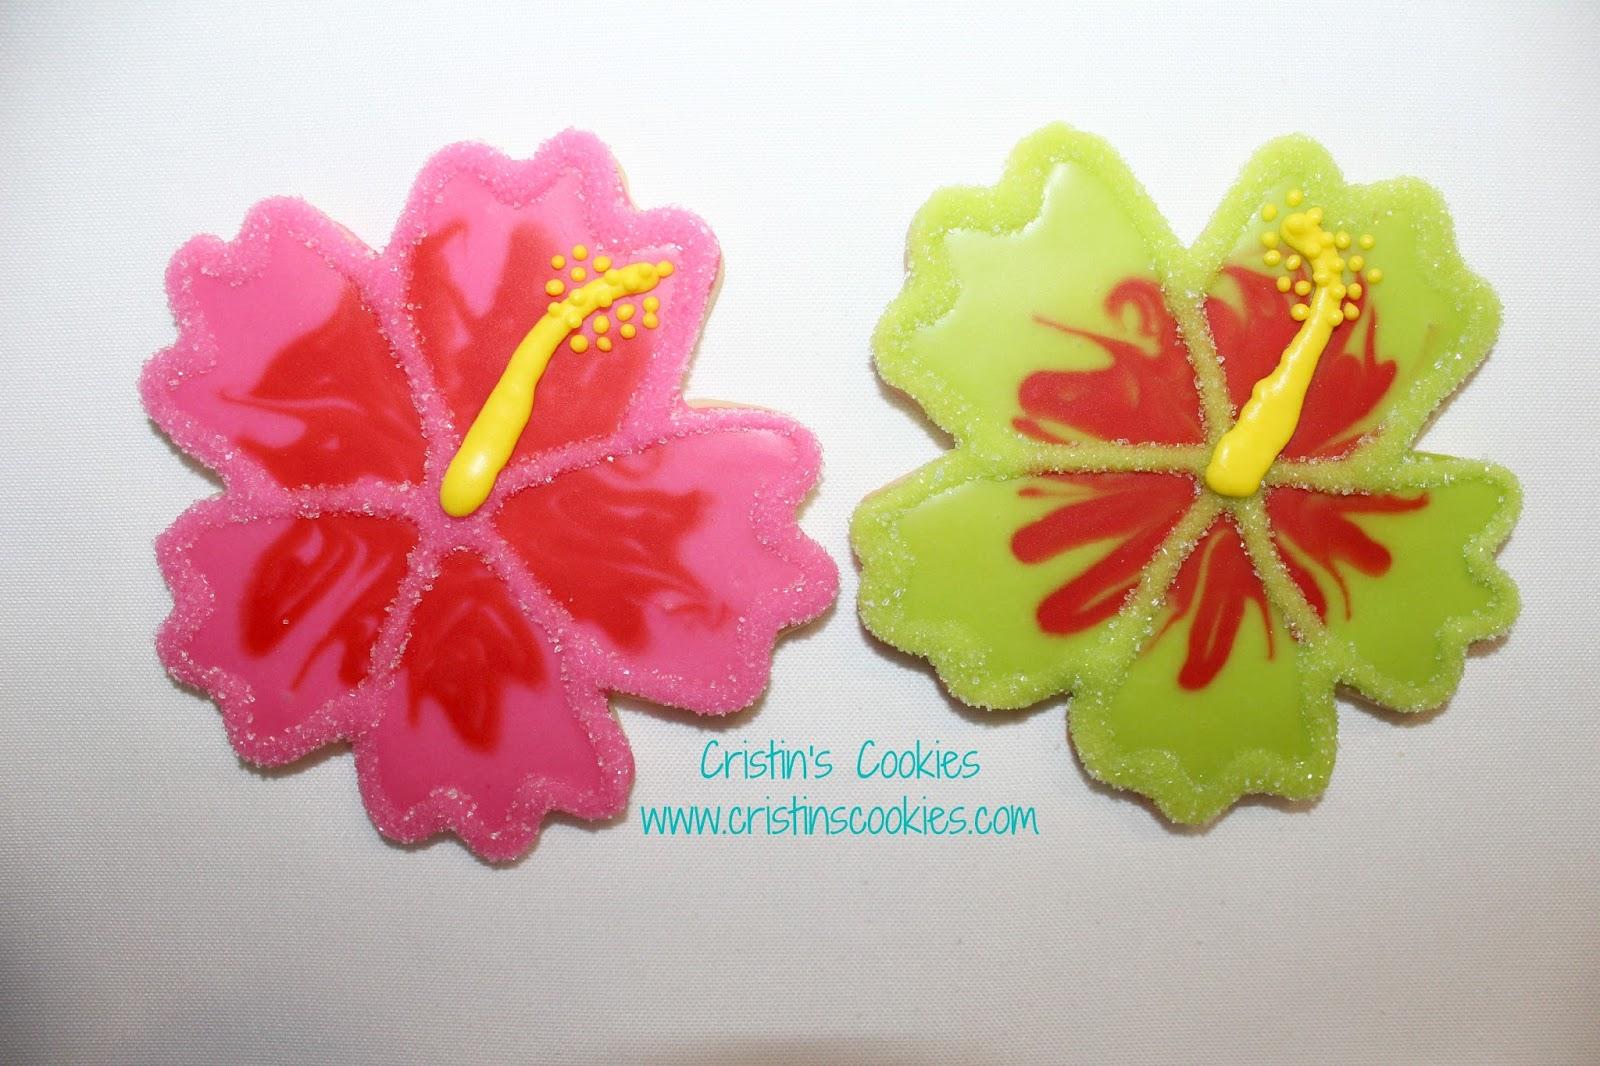 Cristins Cookies Hibiscus Hula Girls And Free Printable Cookie